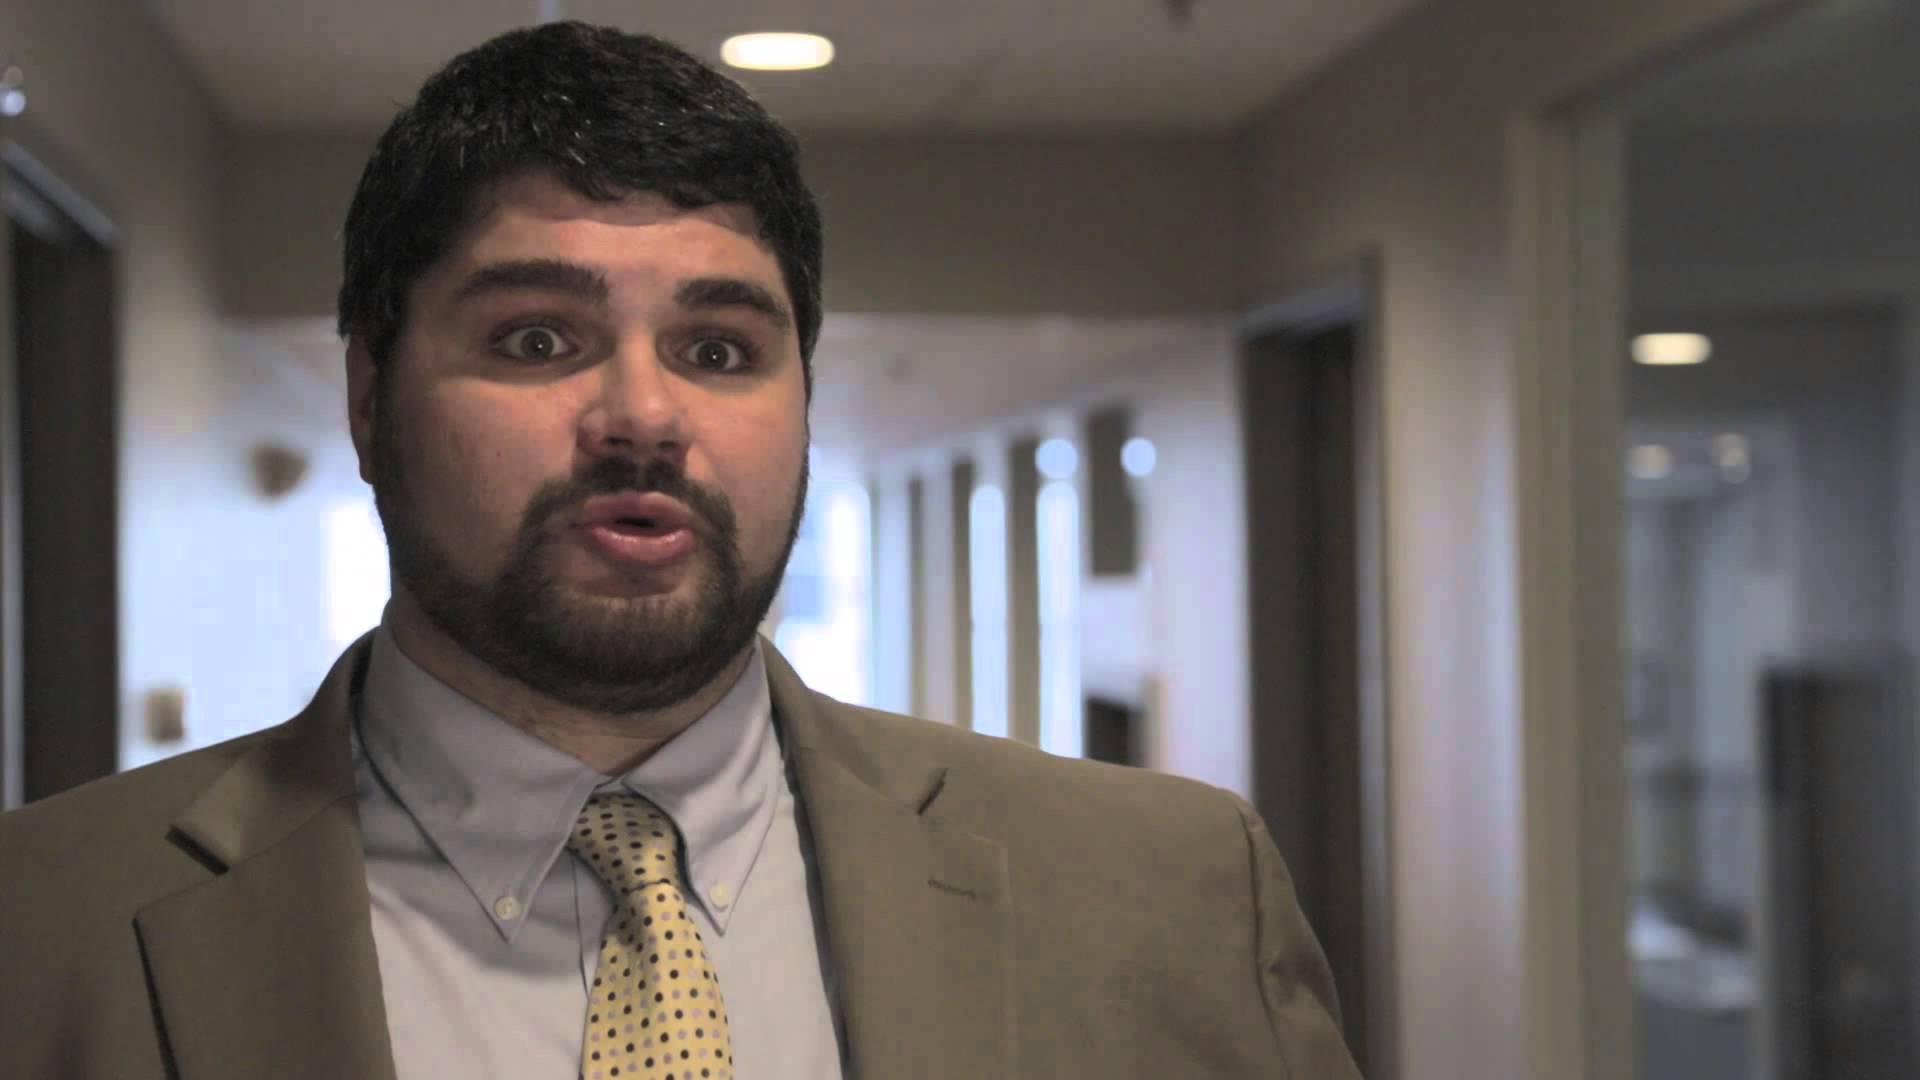 A screenshot from a video about medical malpractice